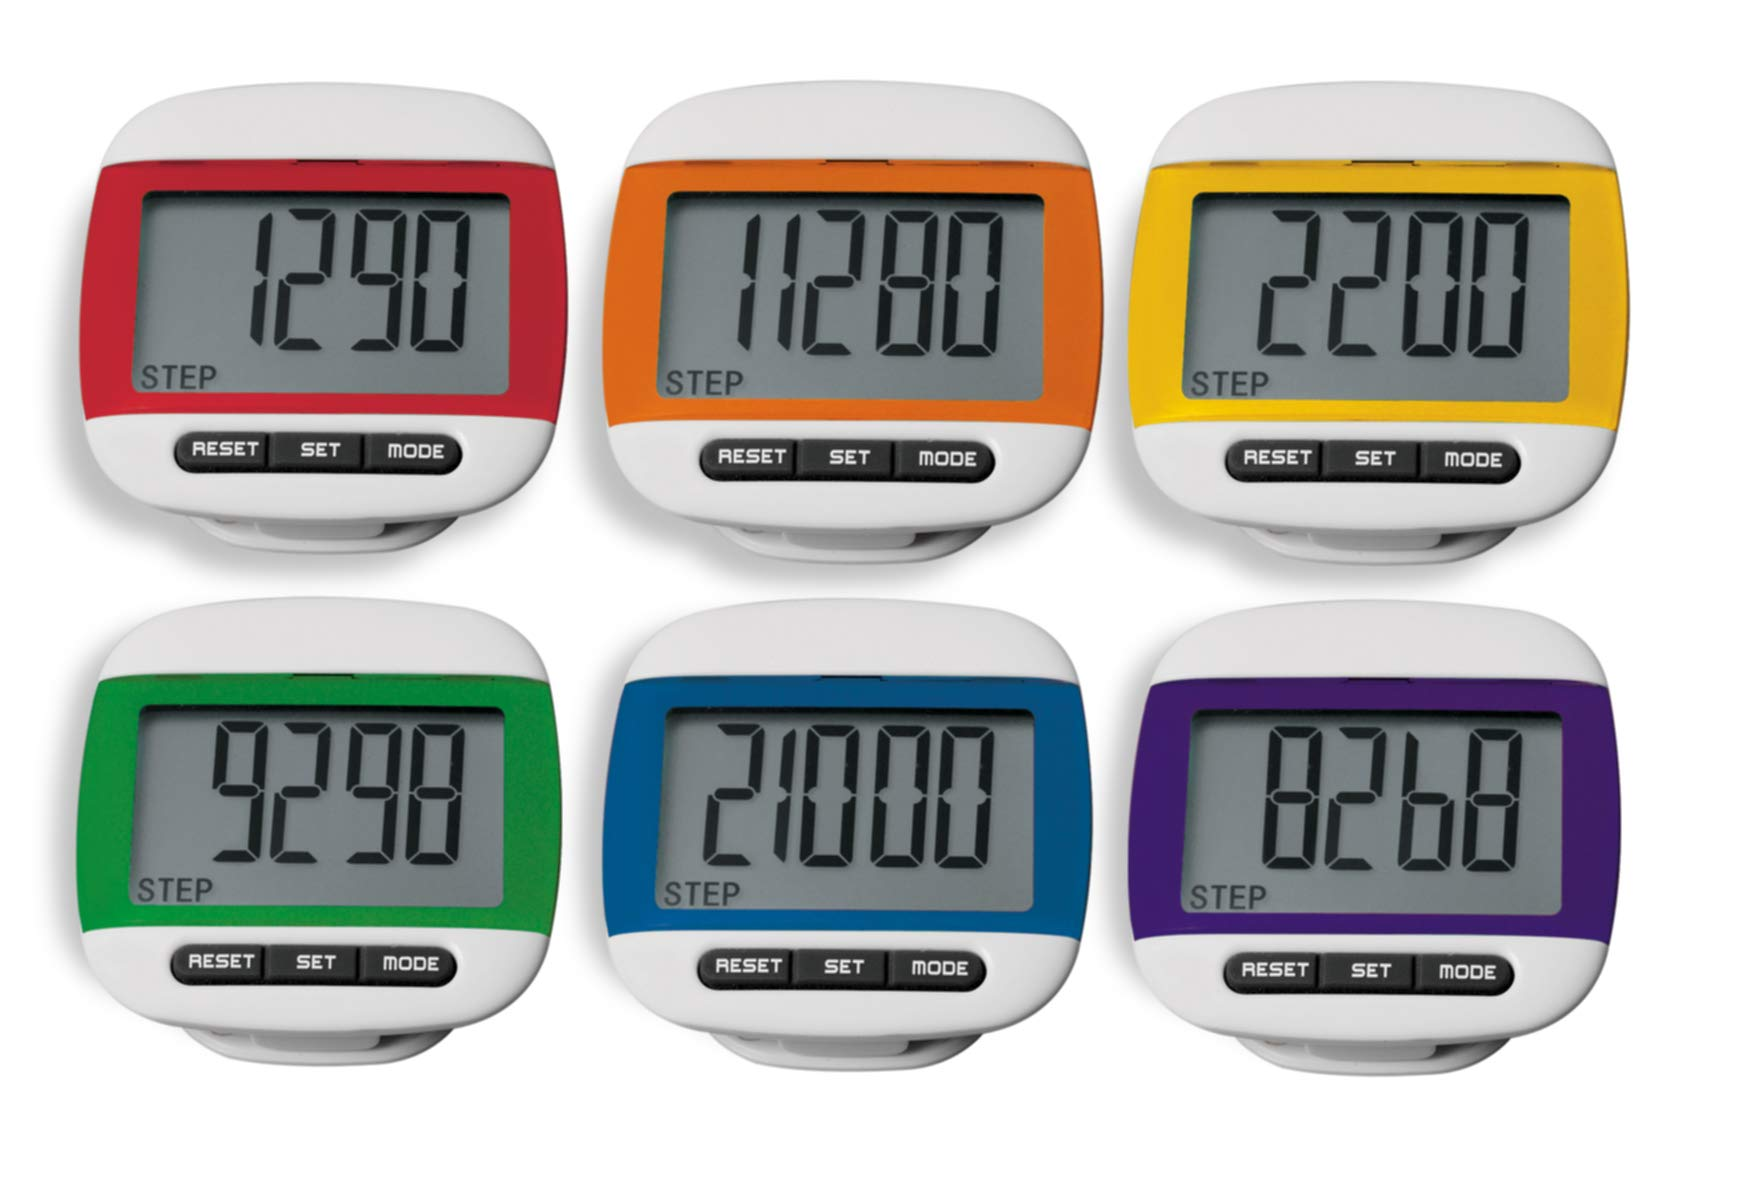 American Educational Products MAC-8013 Pedometer (Pack of 6) by American Educational Products